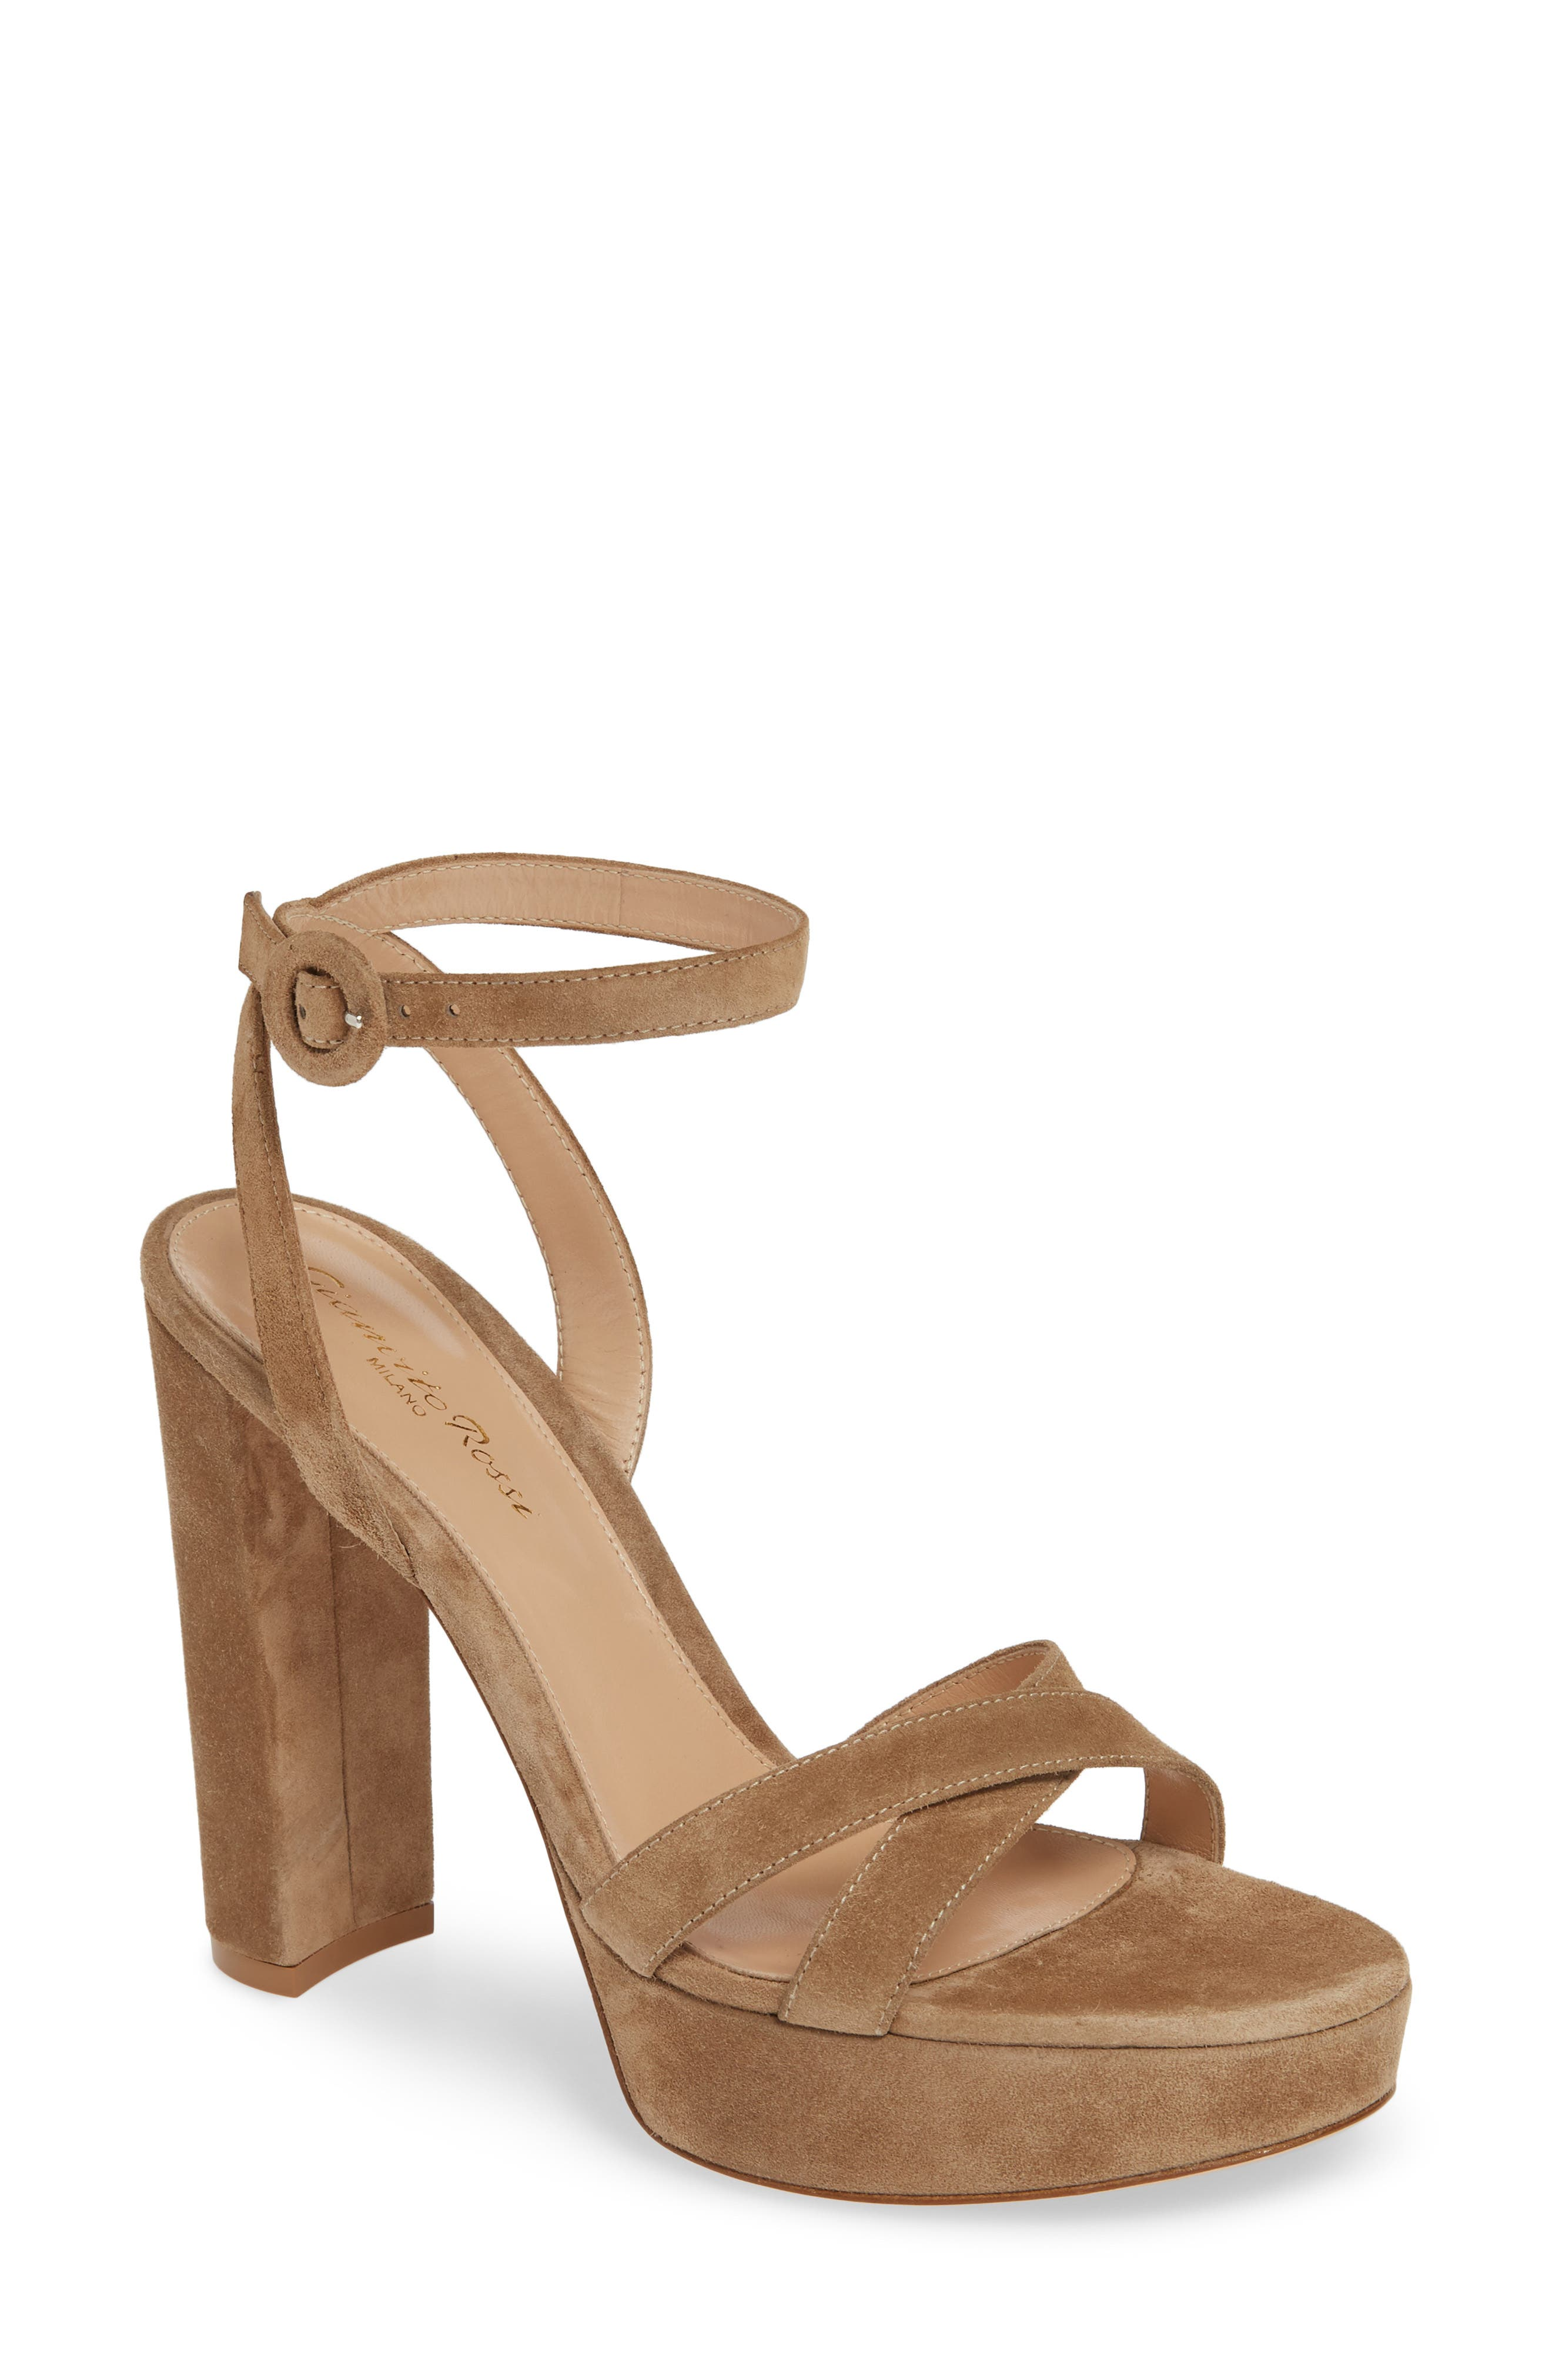 GIANVITO ROSSI, Ankle Strap Platform Sandal, Main thumbnail 1, color, CAMEL SUEDE